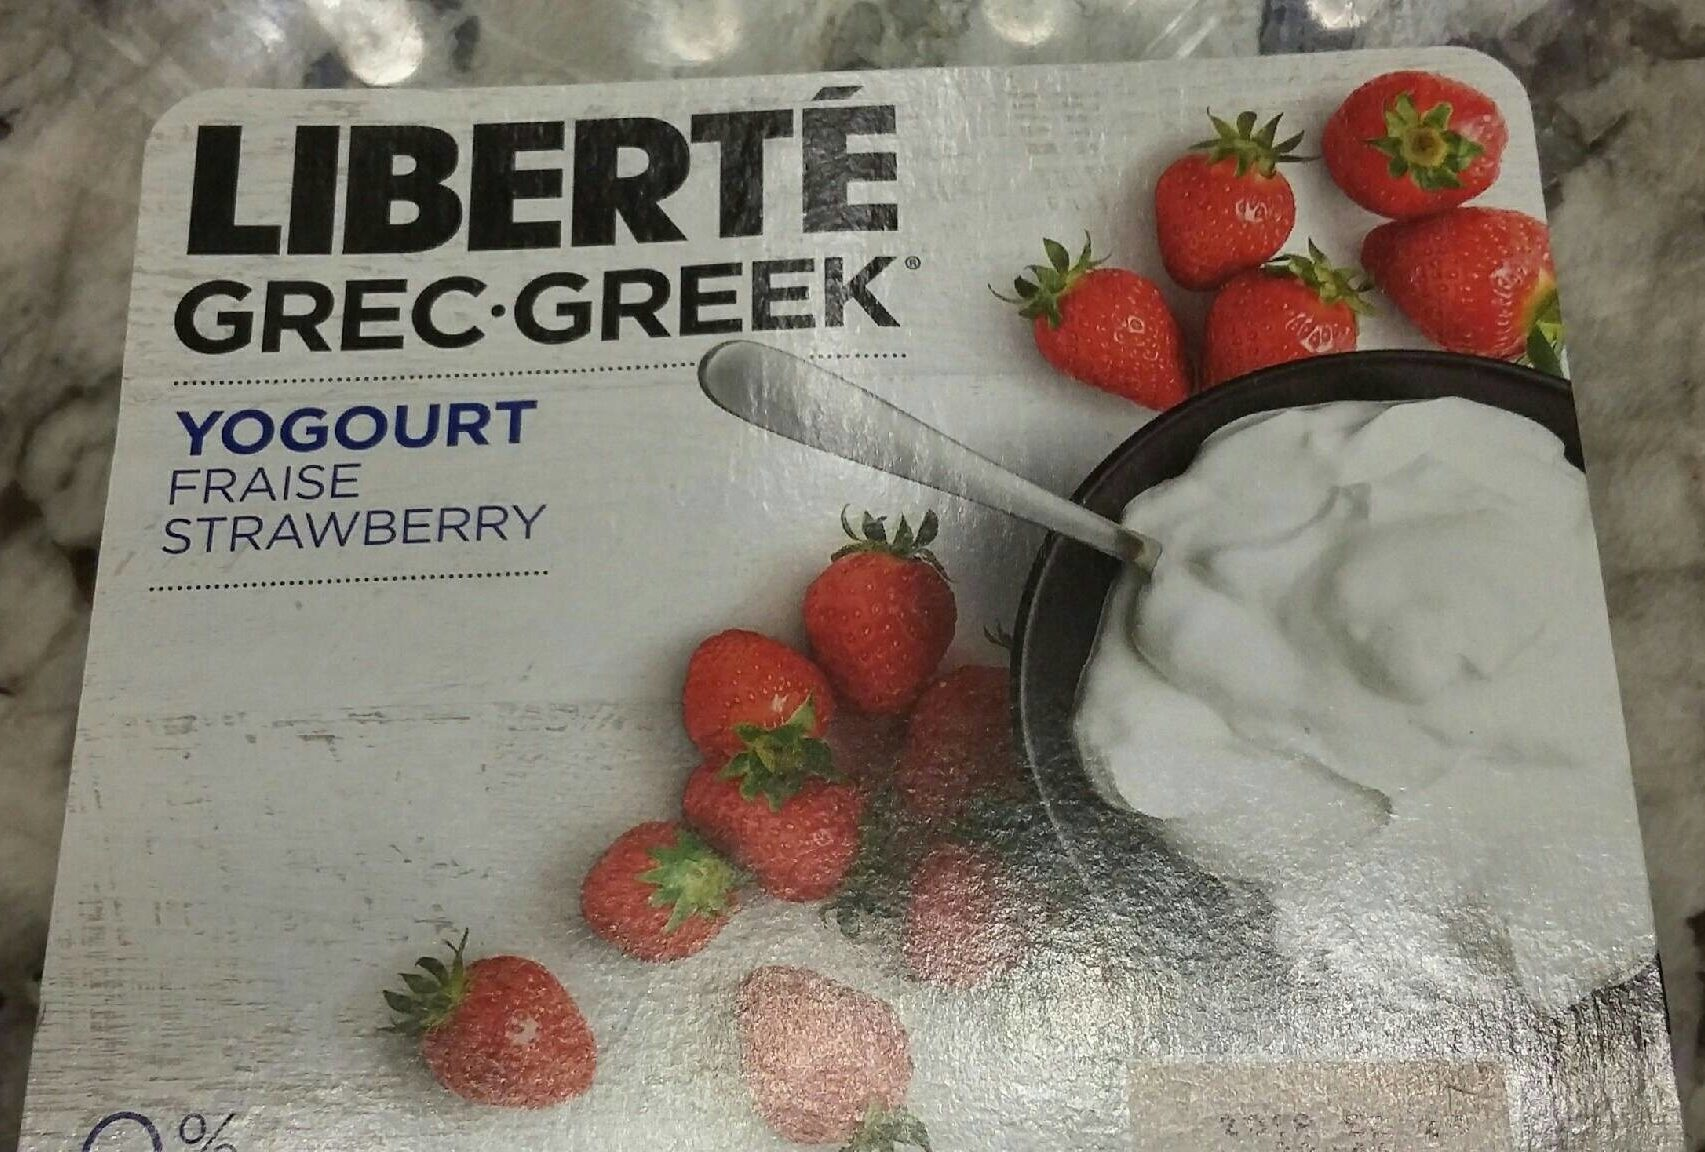 Yogourt fraise - Produit - fr